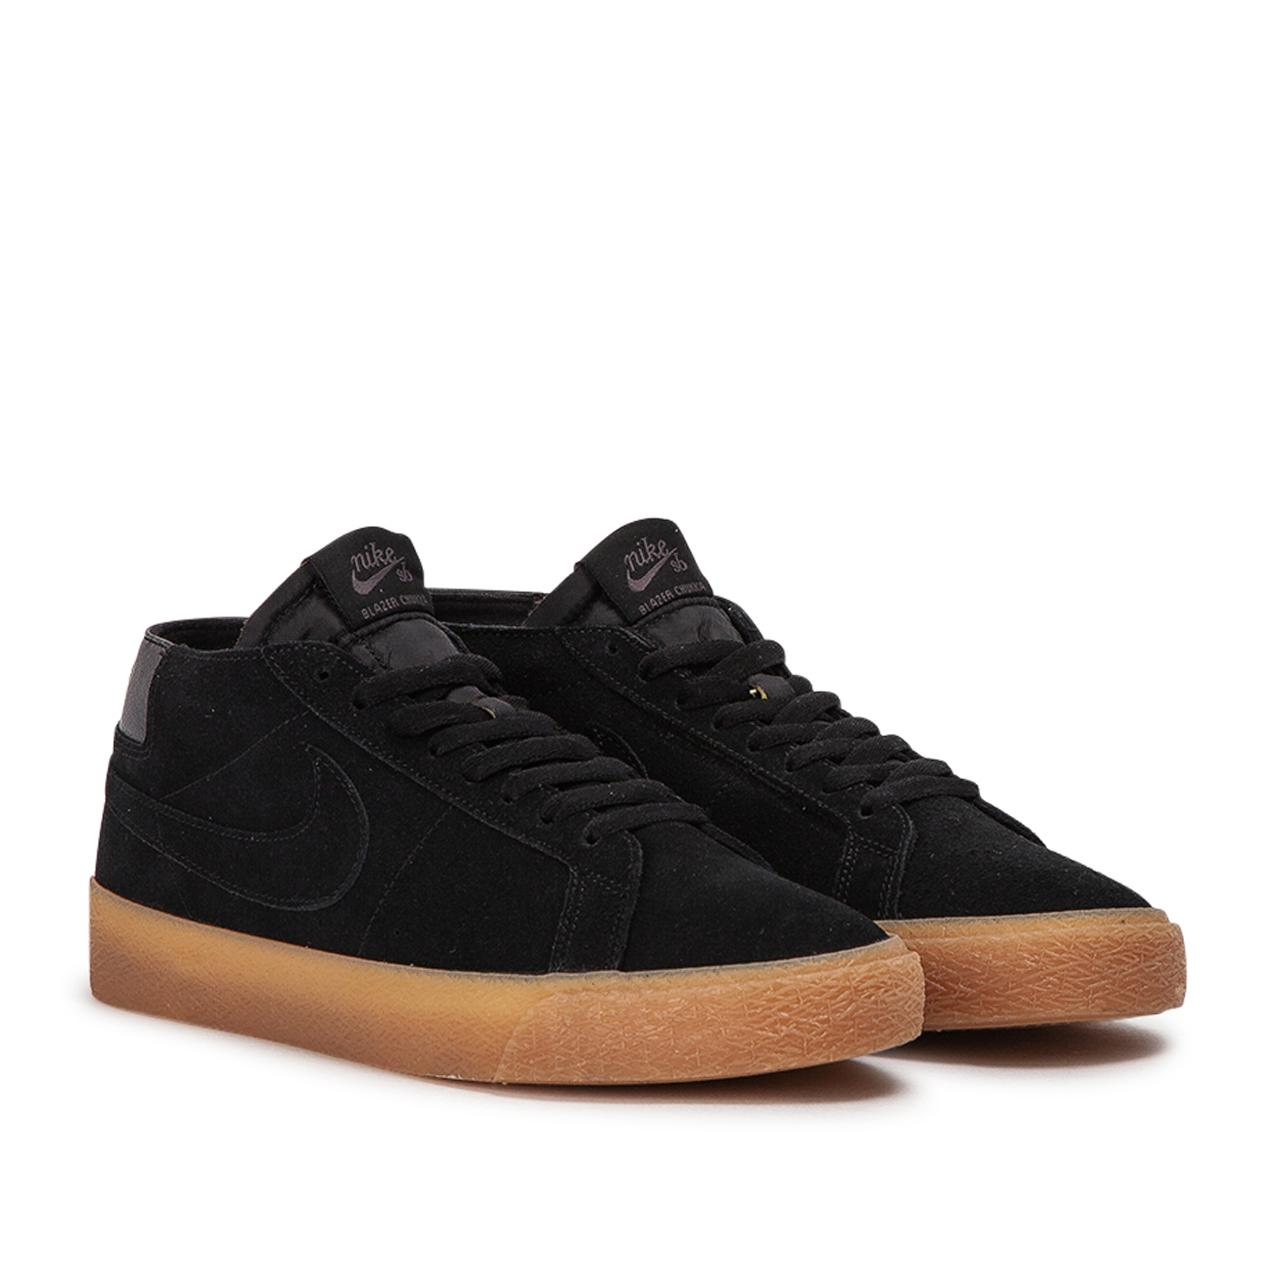 new arrival 937be dff6b Men's Black Nike Sb Zoom Blazer Chukka